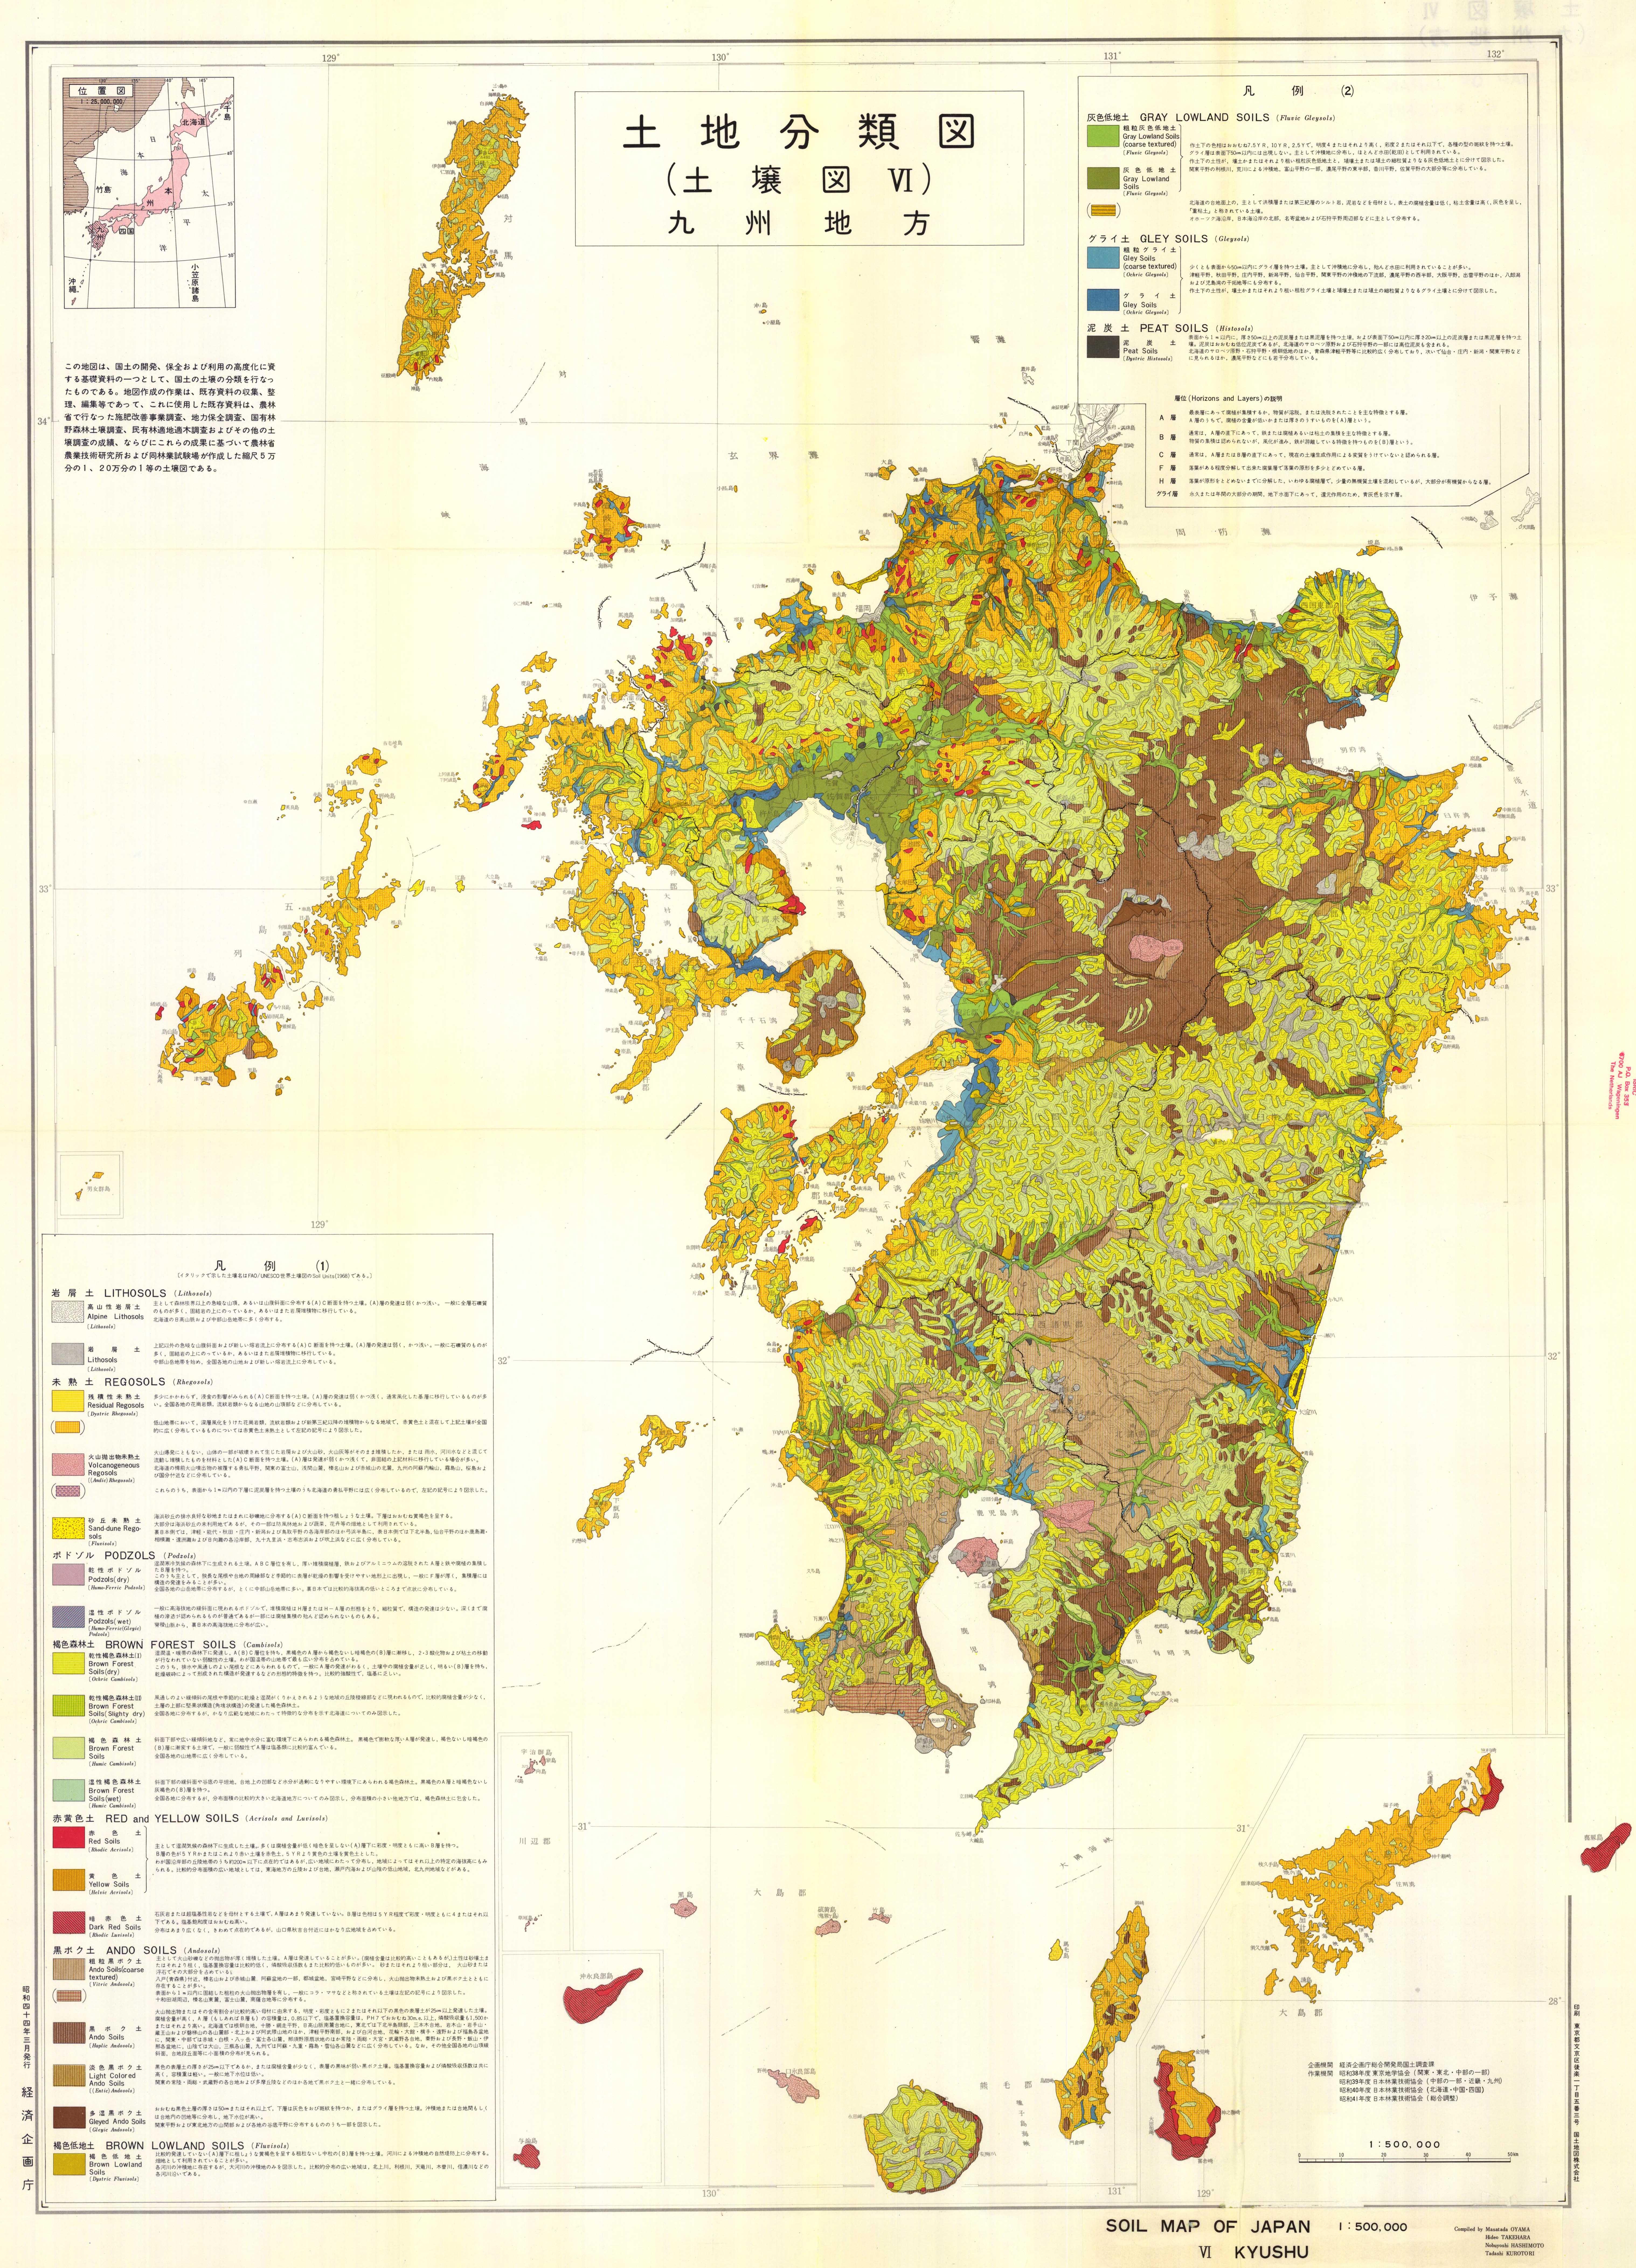 Soil Map of Japan. Map VI. Kyushu. - ESDAC - European Commission Kyushu Japan Map on aomori prefecture japan map, edo japan map, thailand japan map, fukuoka japan map, kanagawa prefecture japan map, iwakuni japan map, nagano prefecture japan map, uruma japan map, minamata japan map, kuji japan map, mount koya japan map, dejima japan map, tokyo japan map, honshu japan map, gifu prefecture japan map, mt. fuji japan map, hokkaido japan map, shikoku japan map, nara japan map, nagasaki japan map,